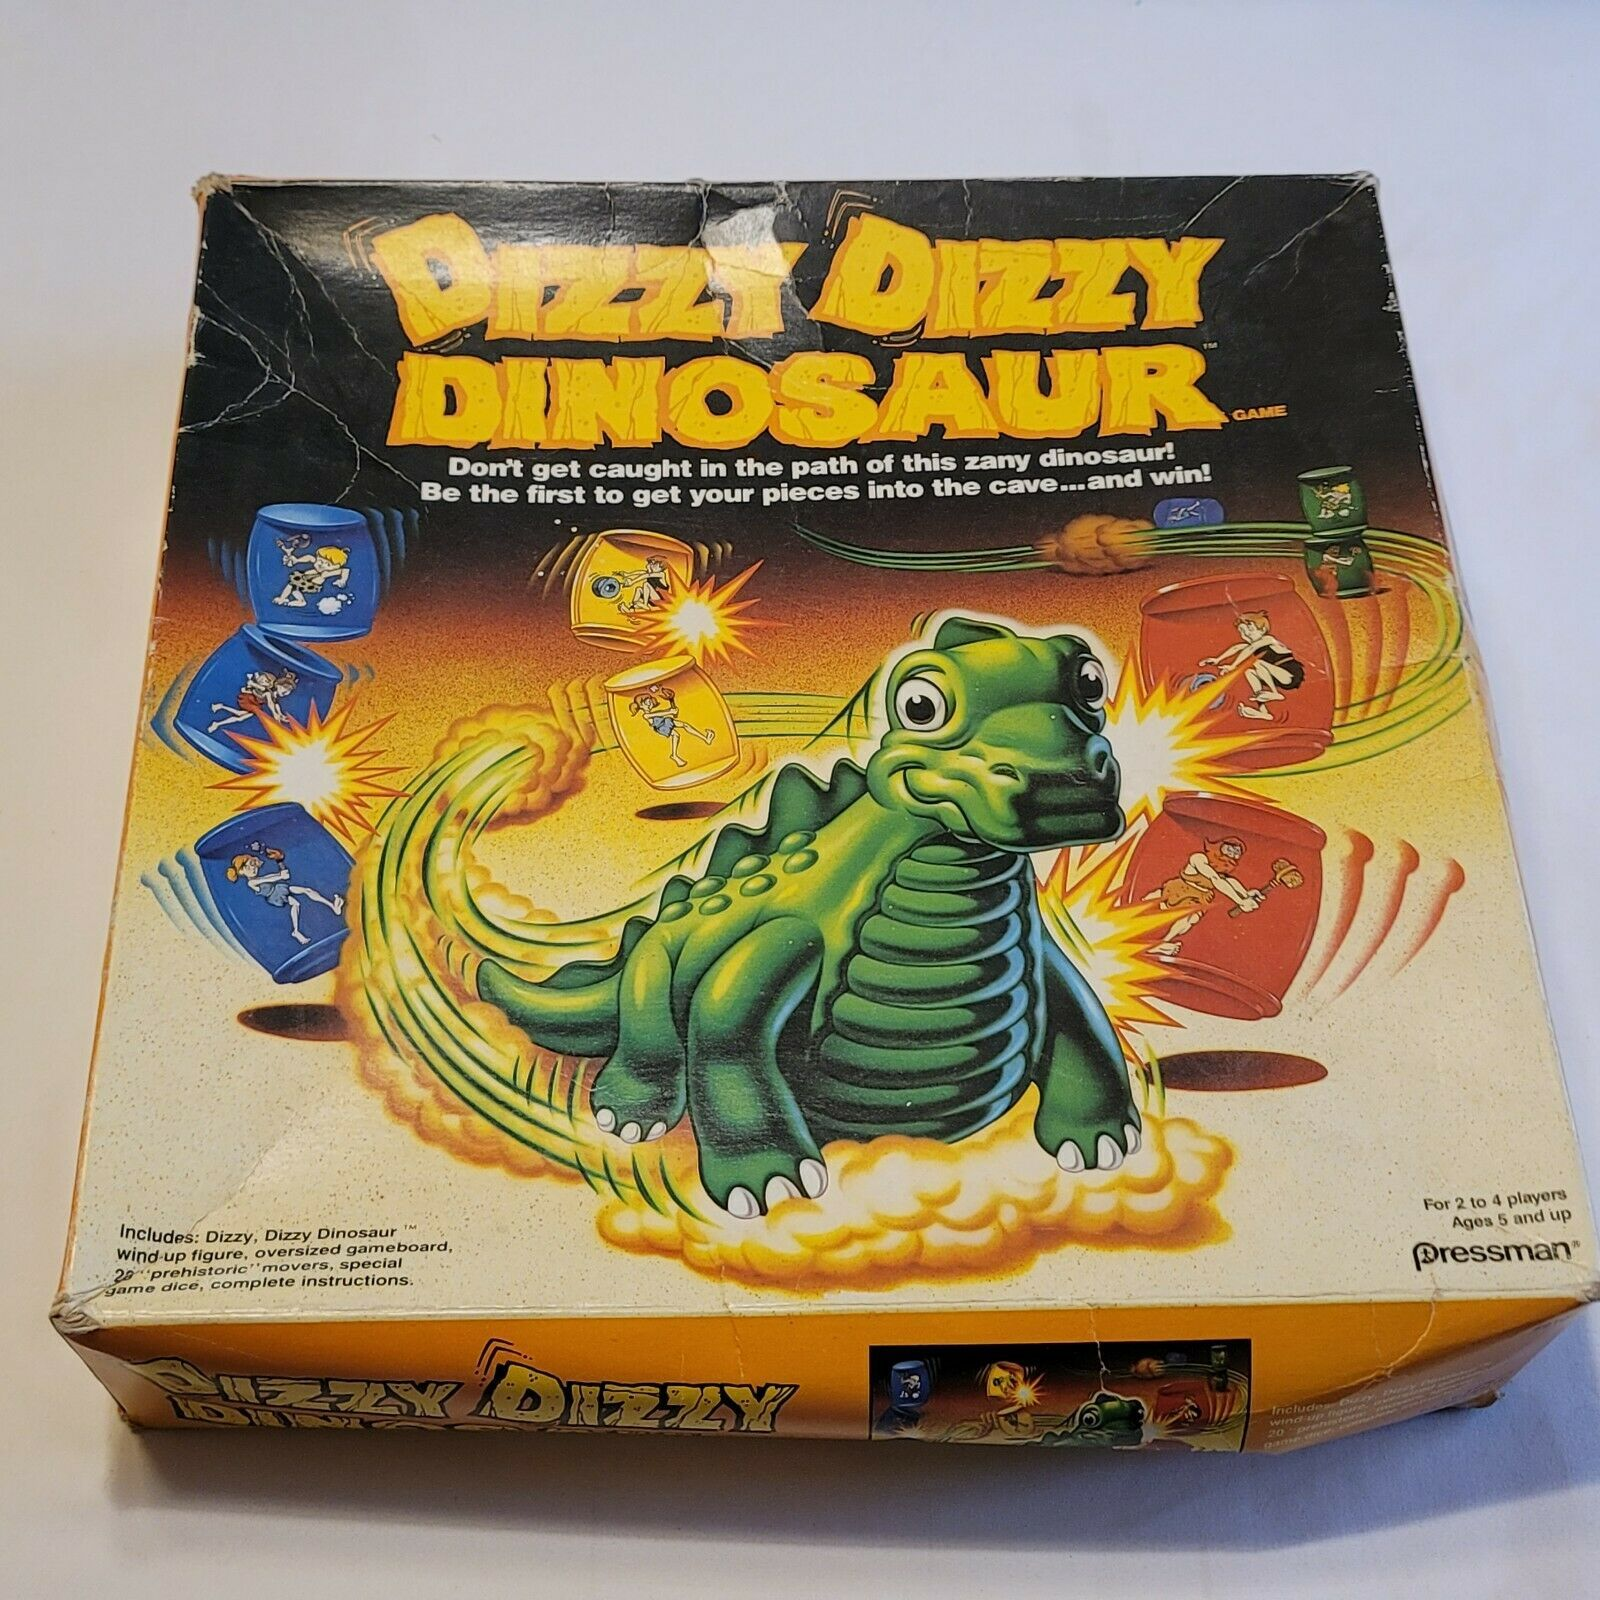 DIZZY DIZZY DINOSAUR Board Game 1987 Pressman 100% Complete #9100  - £25.12 GBP